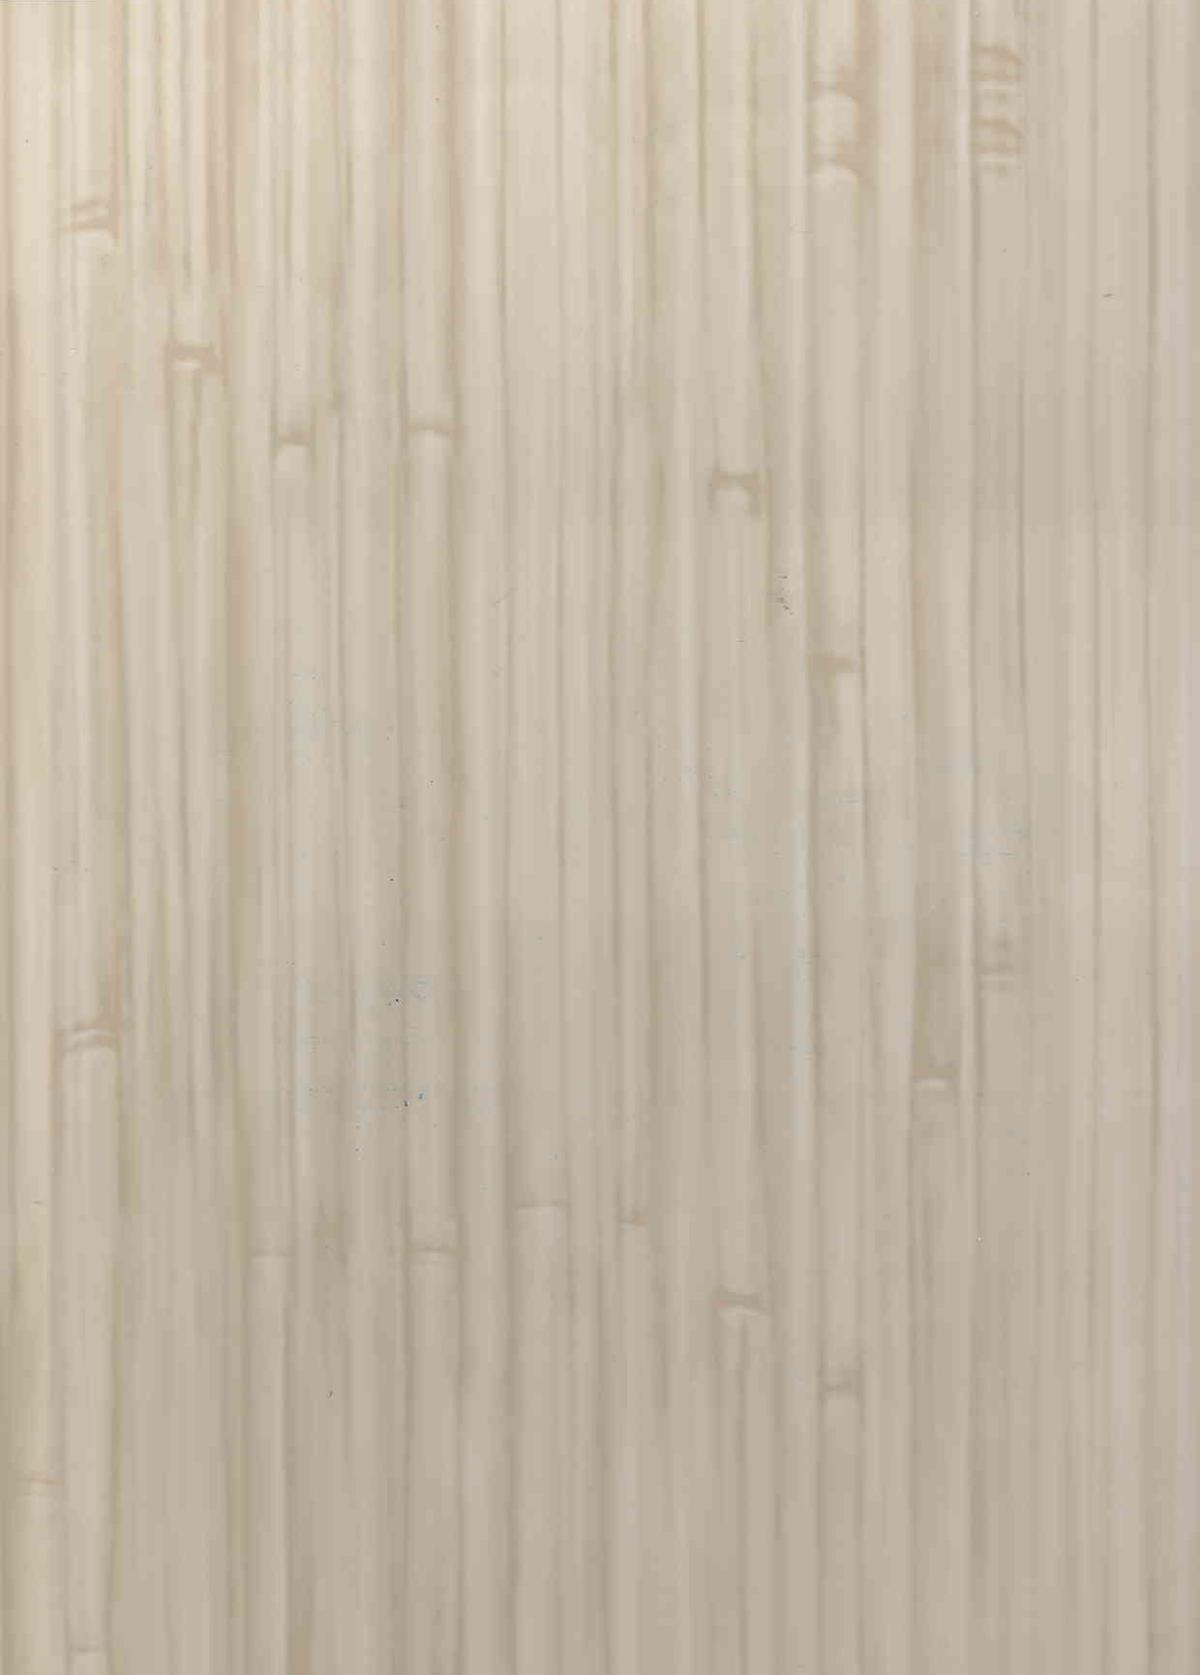 Пластиковая вагонка ПВХ, ширина 25 см, бамбук глянец